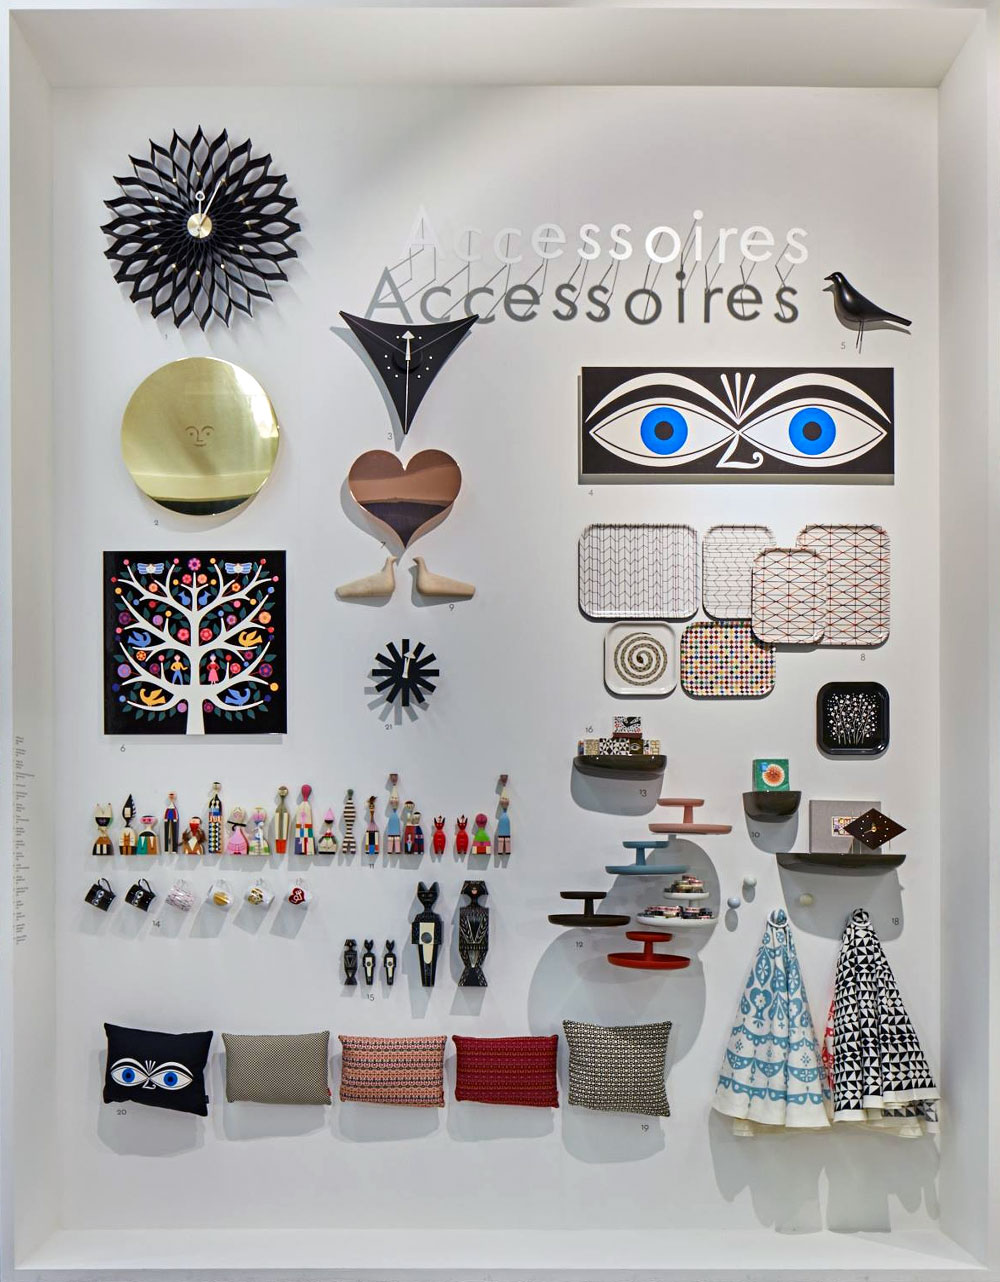 Vitra-imm-cologne-2016-accessoires